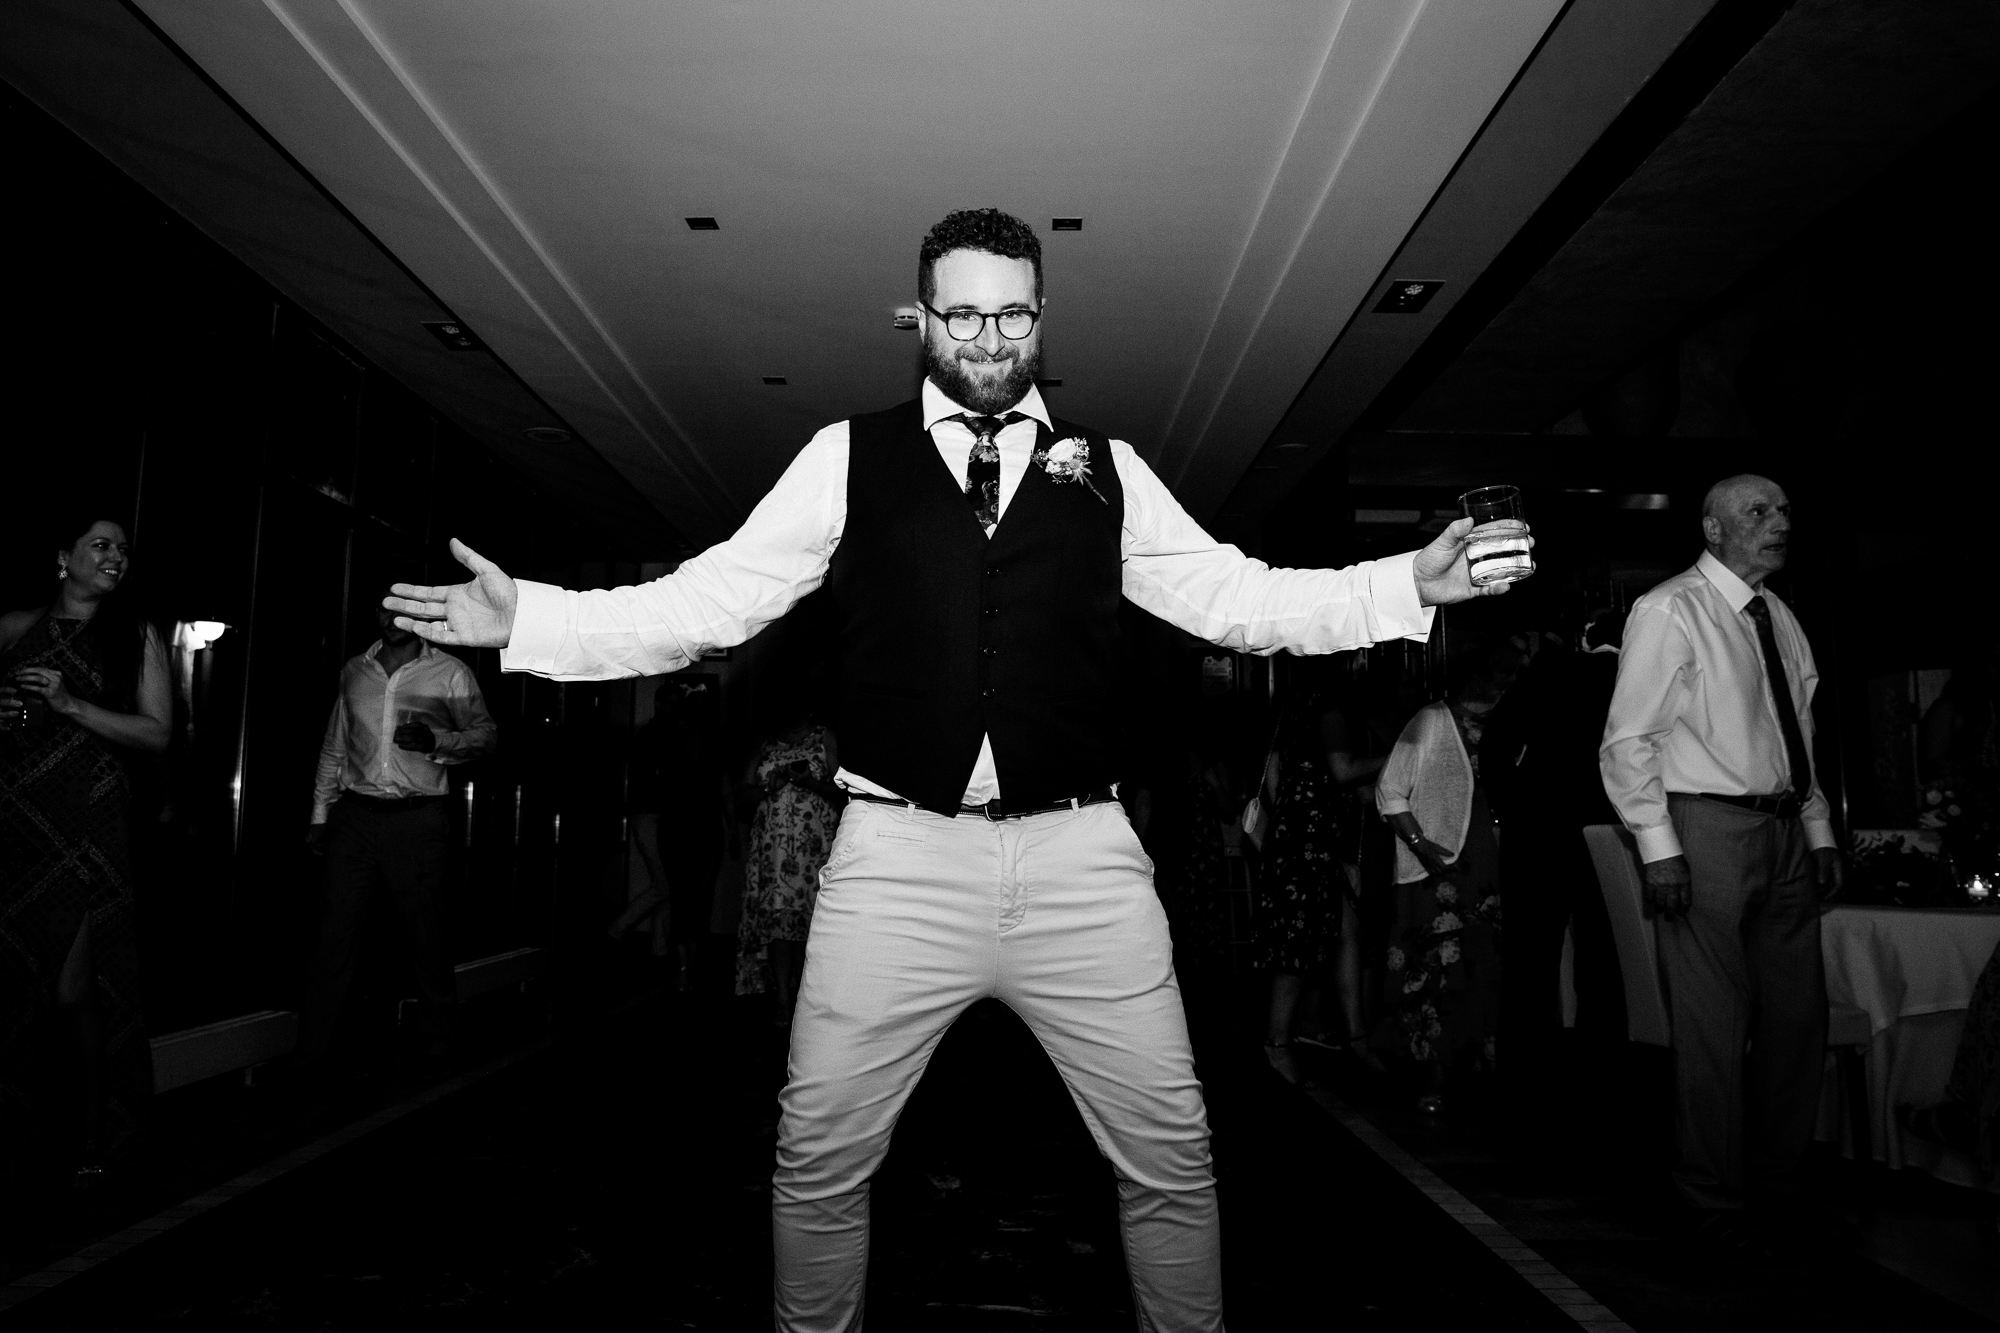 wedding guest dances in the middle of dance floor at Denia wedding